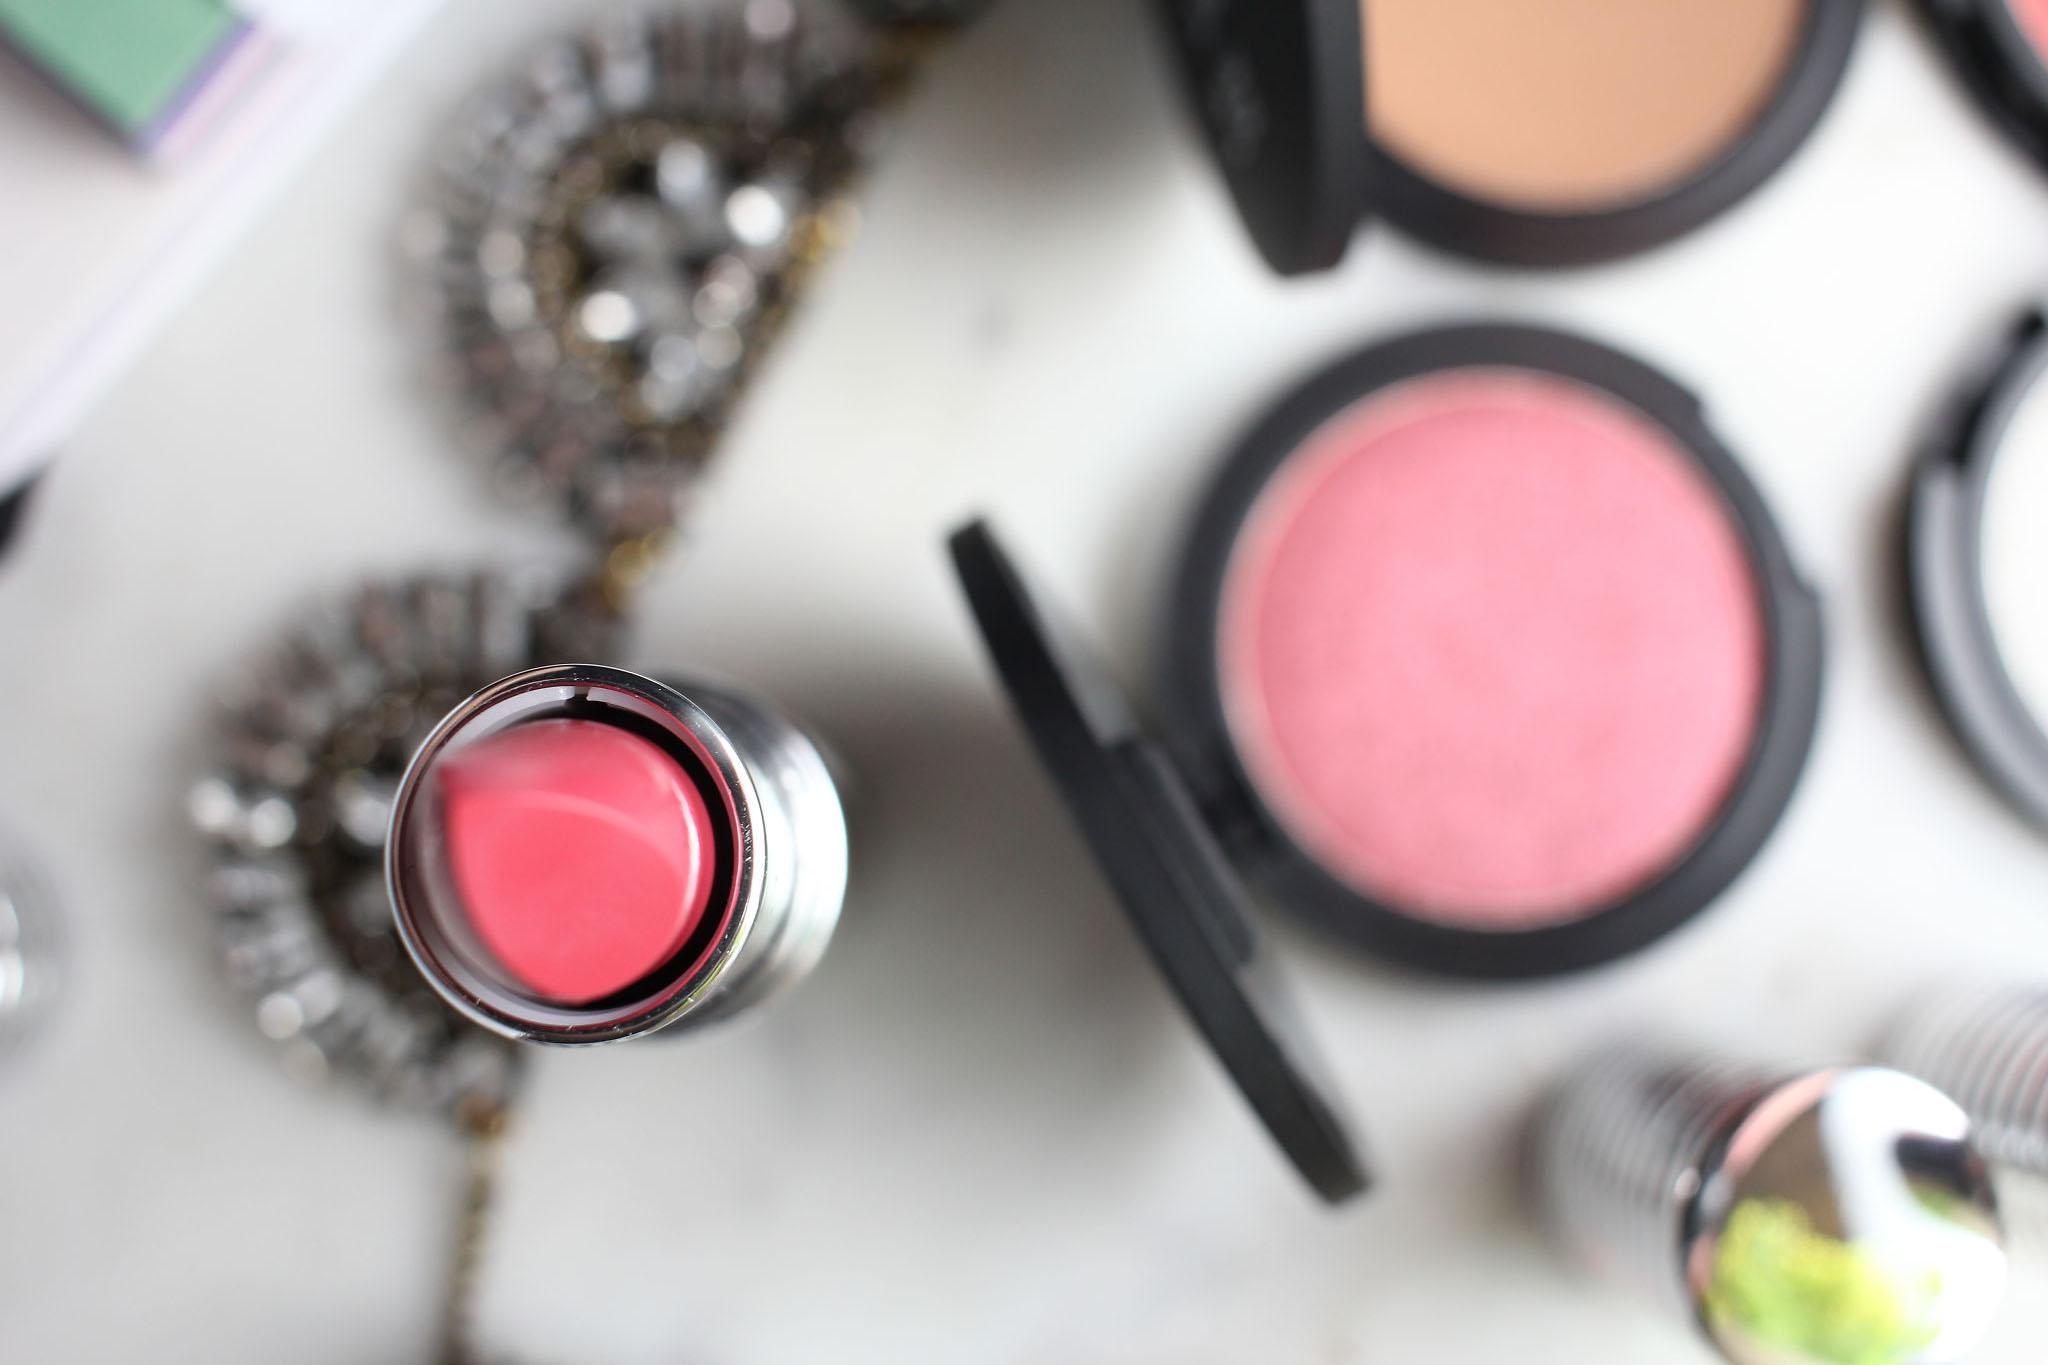 Le Metier De Beaute Rose Garnet